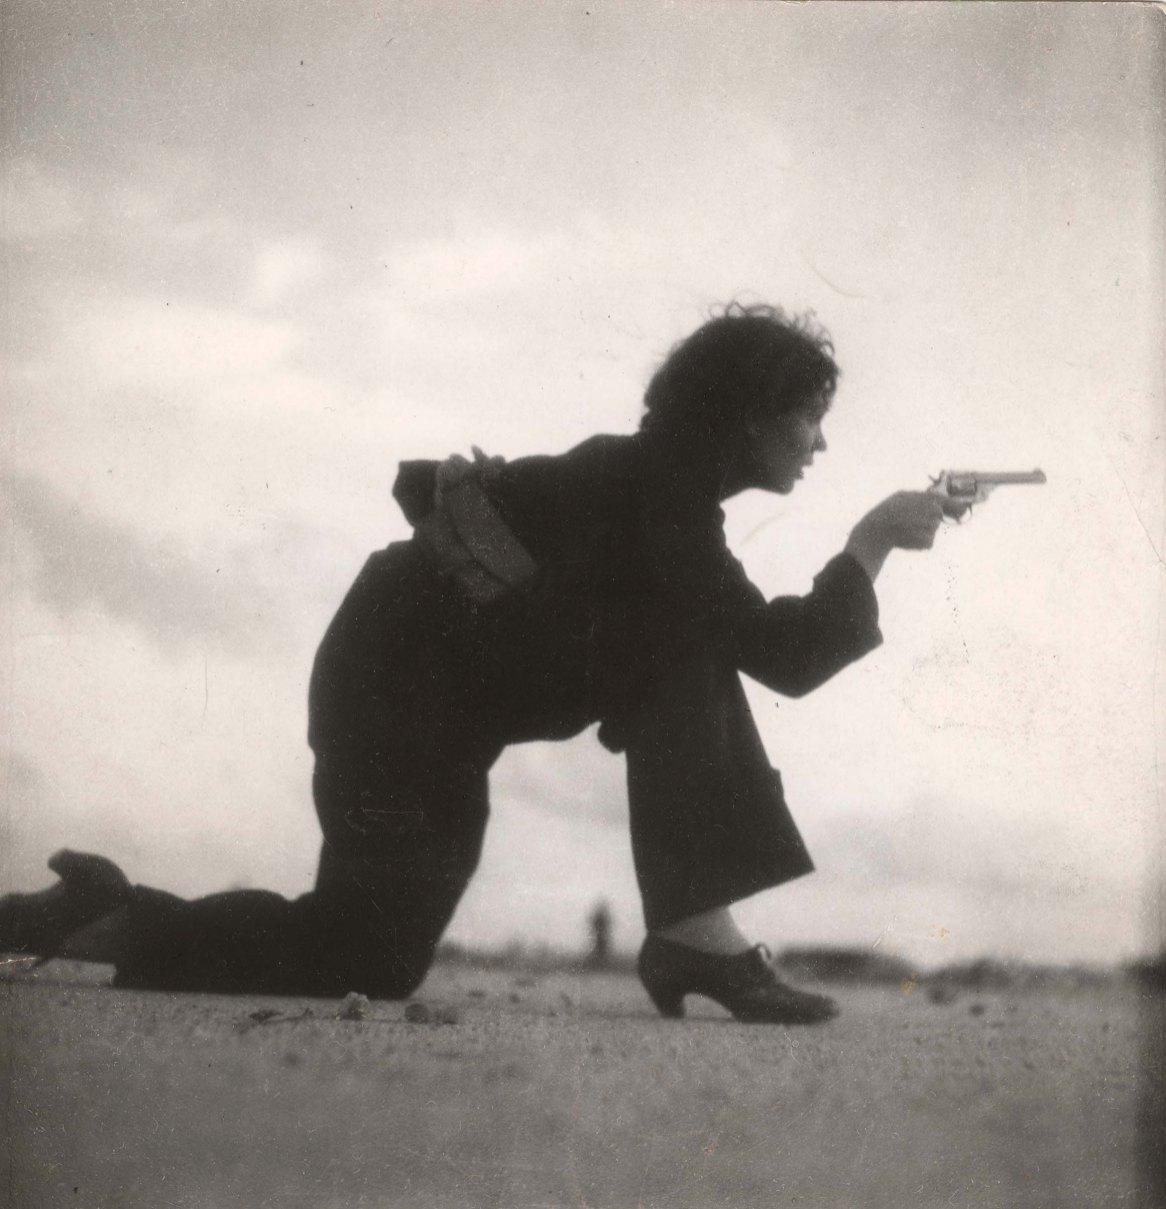 Gerda Taro, Woman training, Barcelone, 1936.